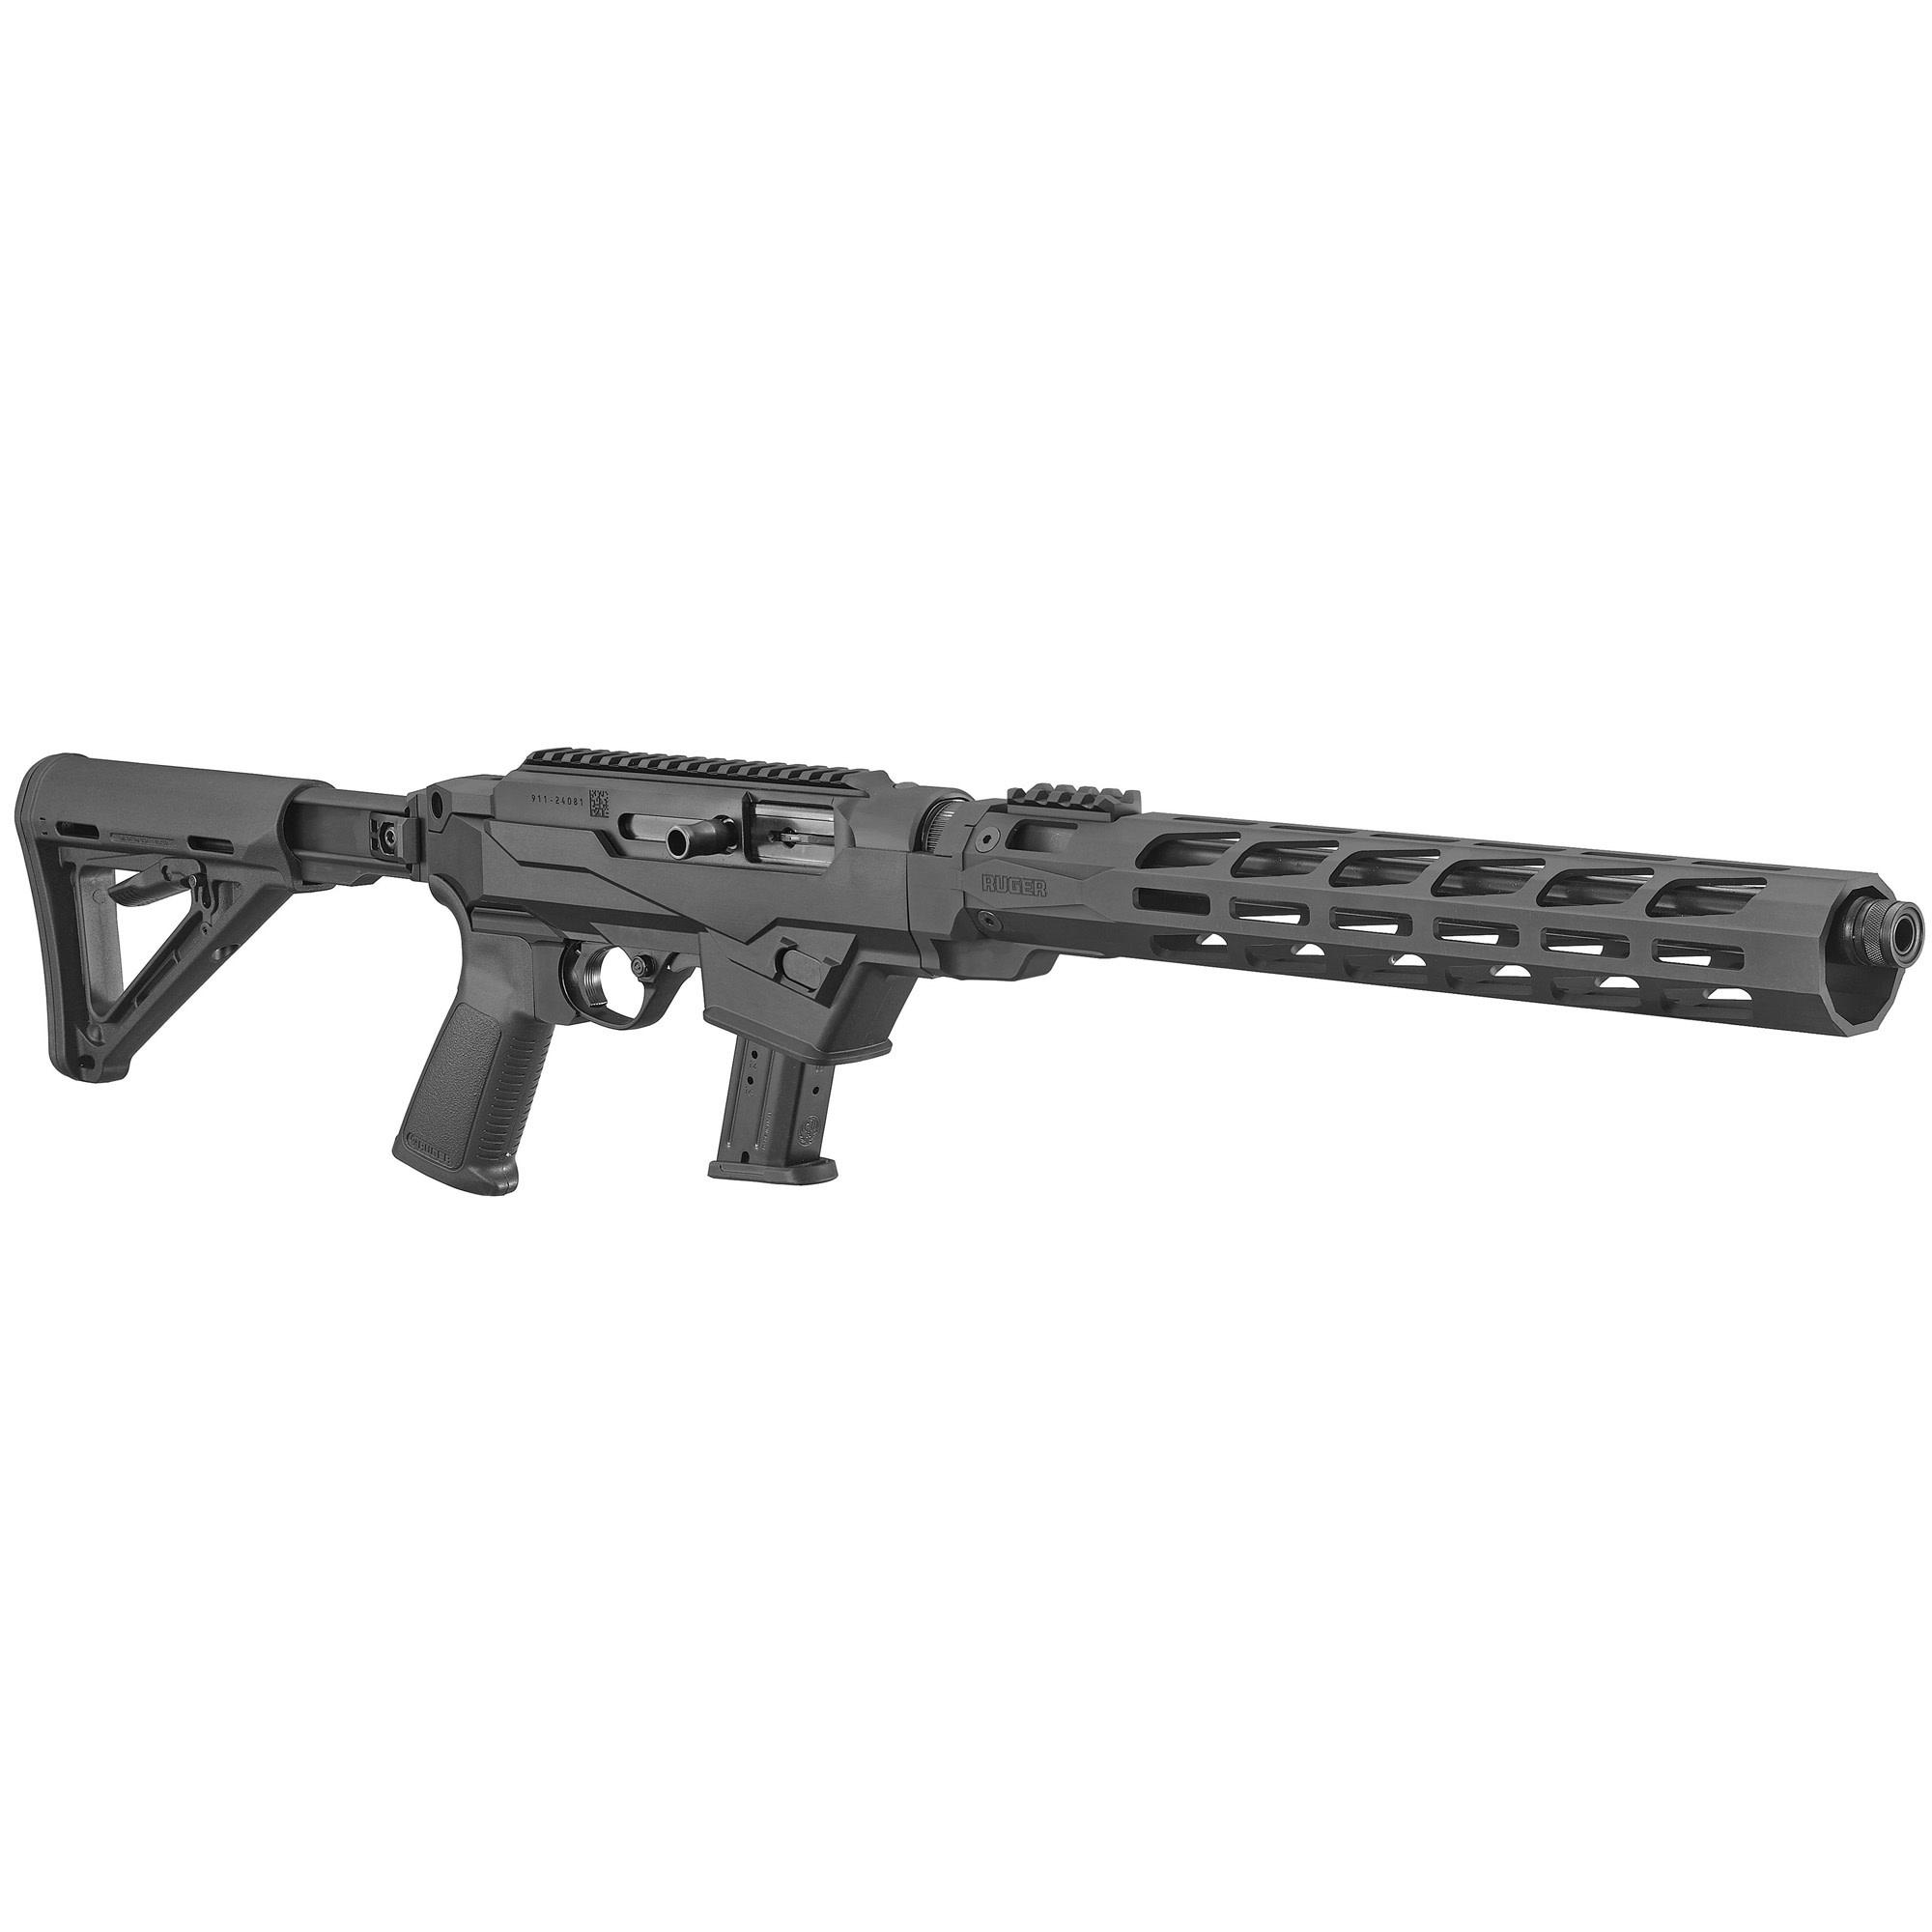 Ruger PC Carbine 9mm Luger 16.12'' 17+1 Black Hard Coat Anodized Adjustable Magpul MOE Stock